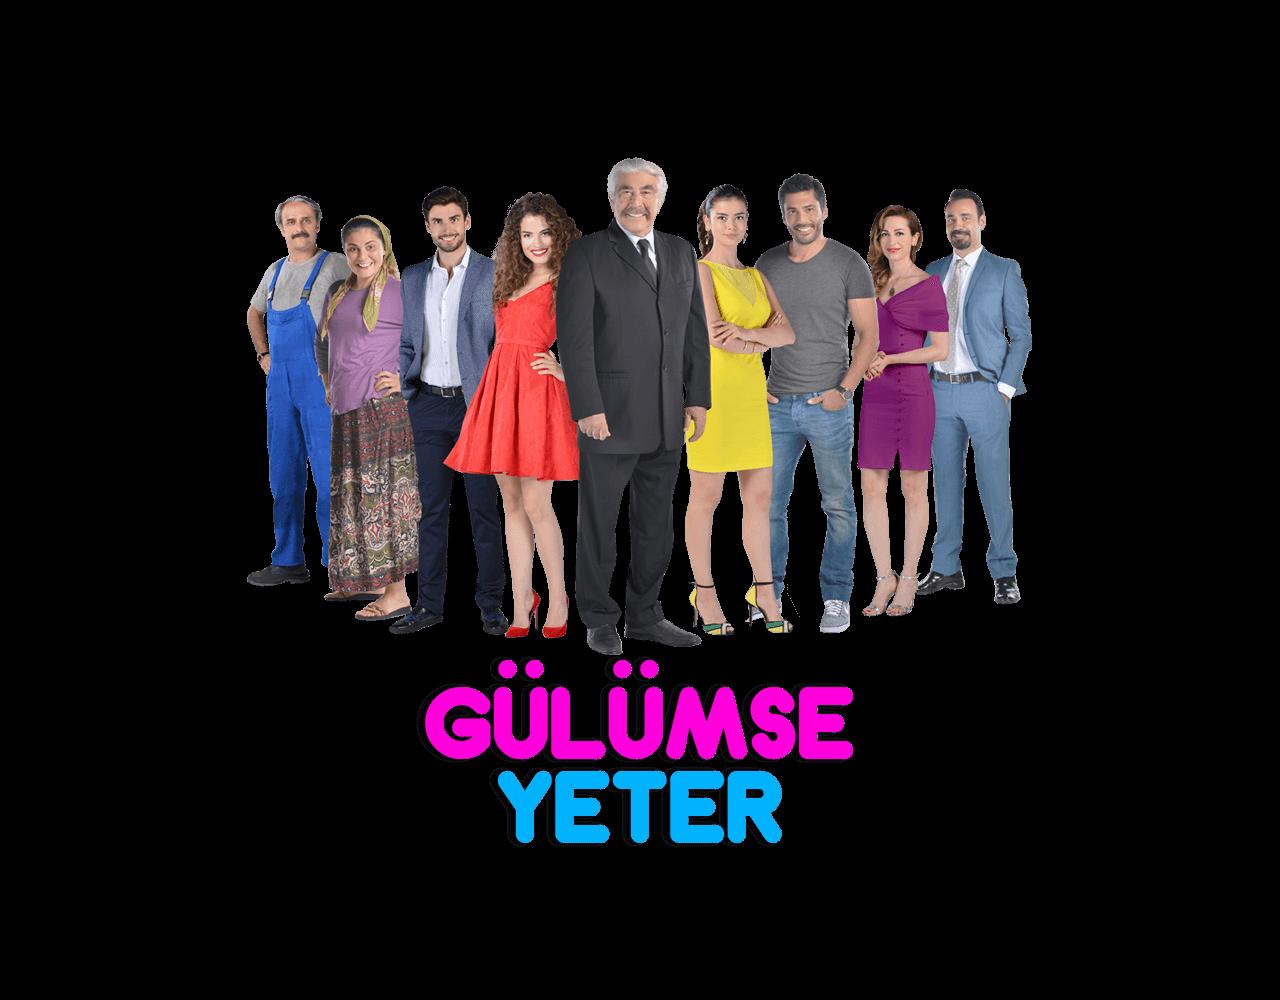 Gulumse Yeter 3 Bolum 2 Agustos 2016 Izle Gulumseyeter Https Lnkd In Ebyvx7w Movie Posters Movies Poster